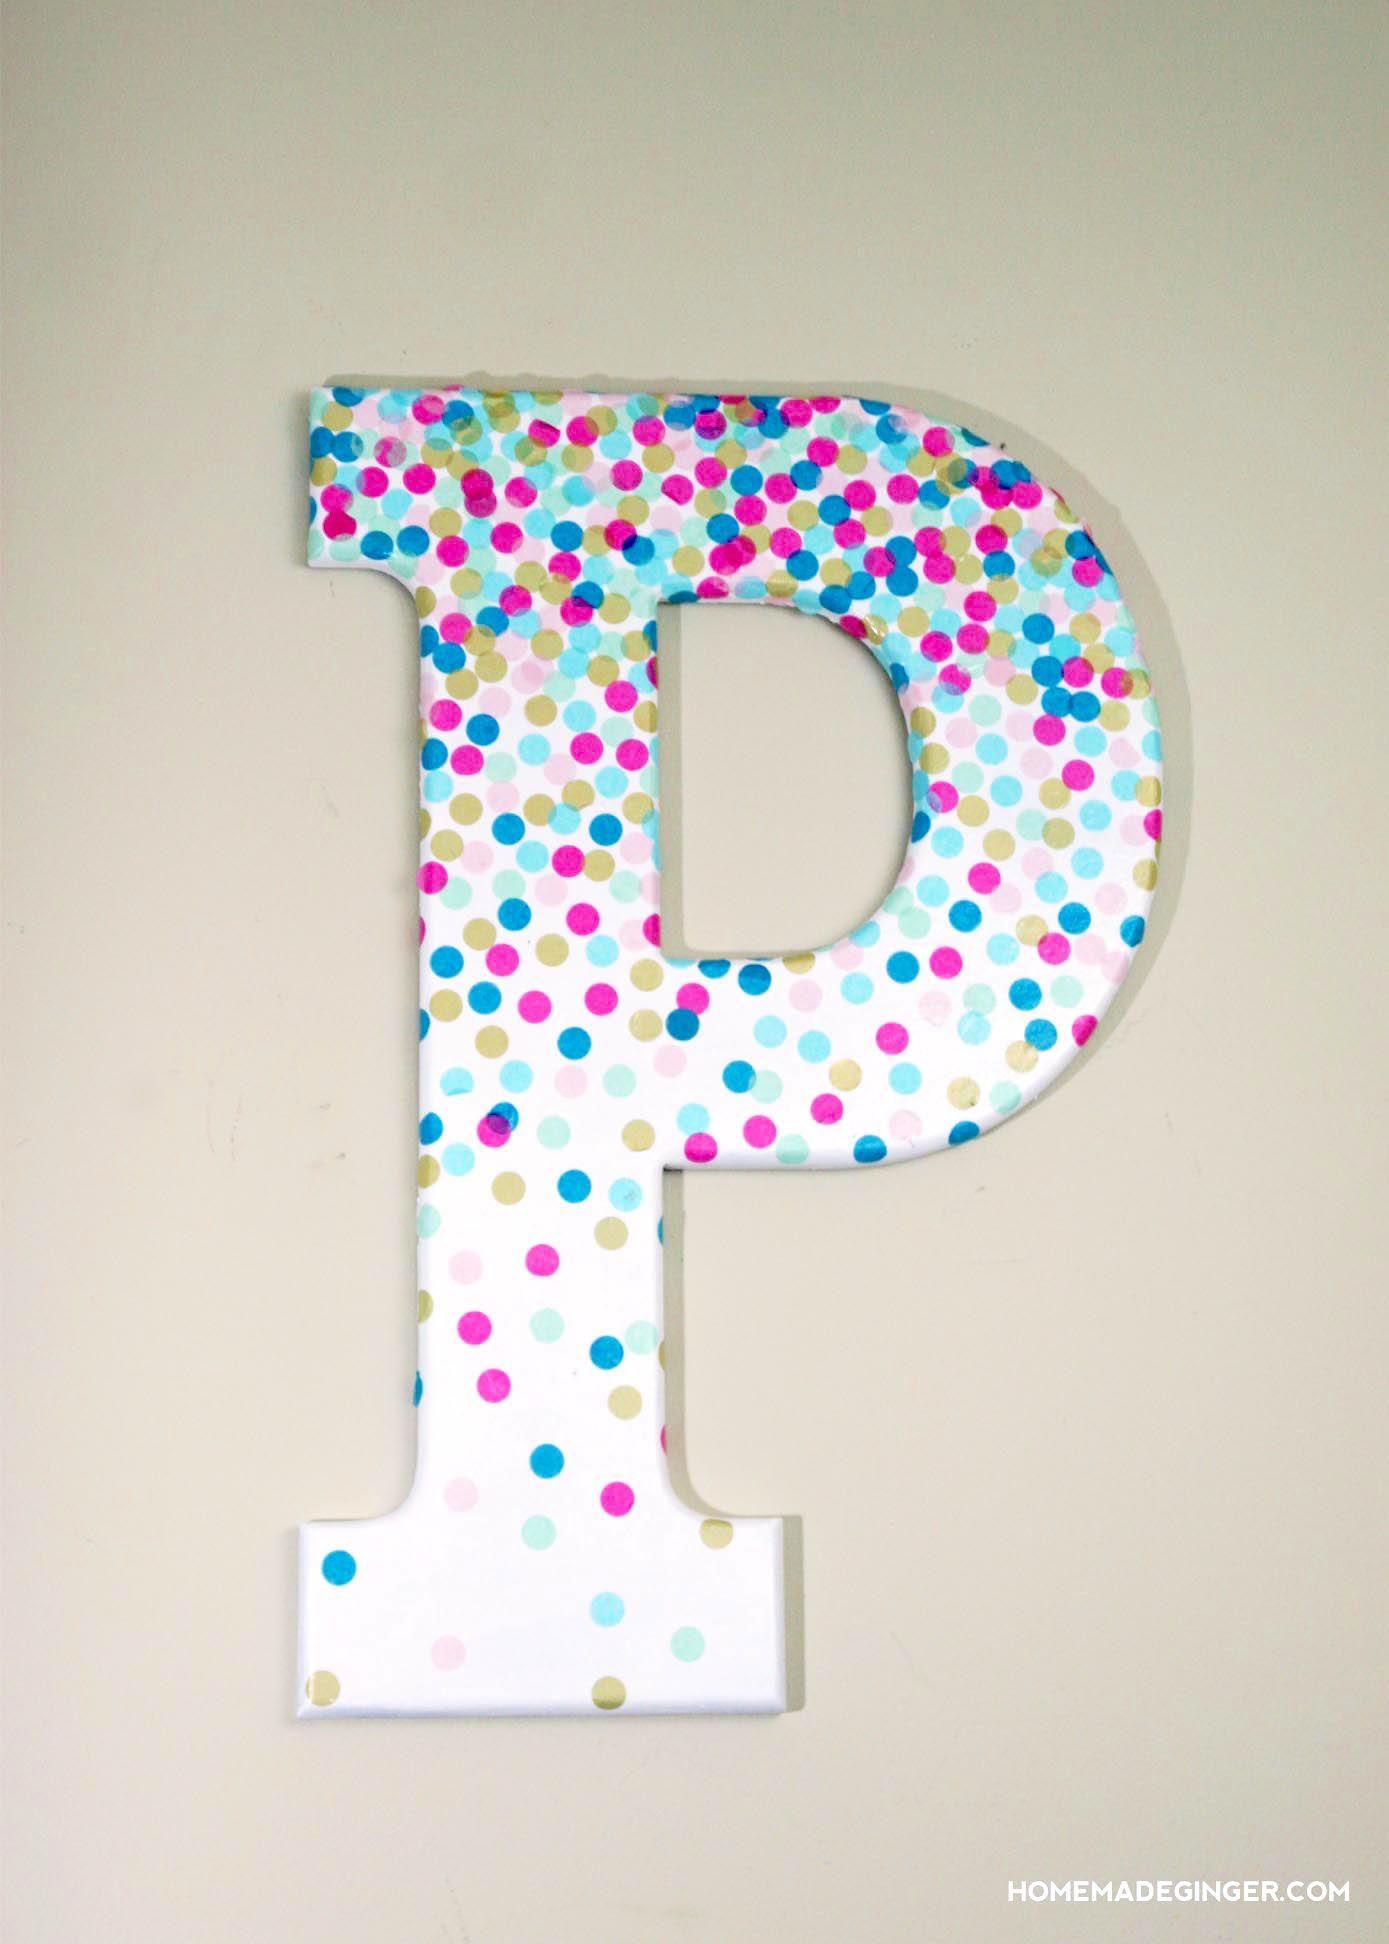 Confetti decorative letters for wall decor confetti letters and confetti decorative letters for wall decor amipublicfo Image collections